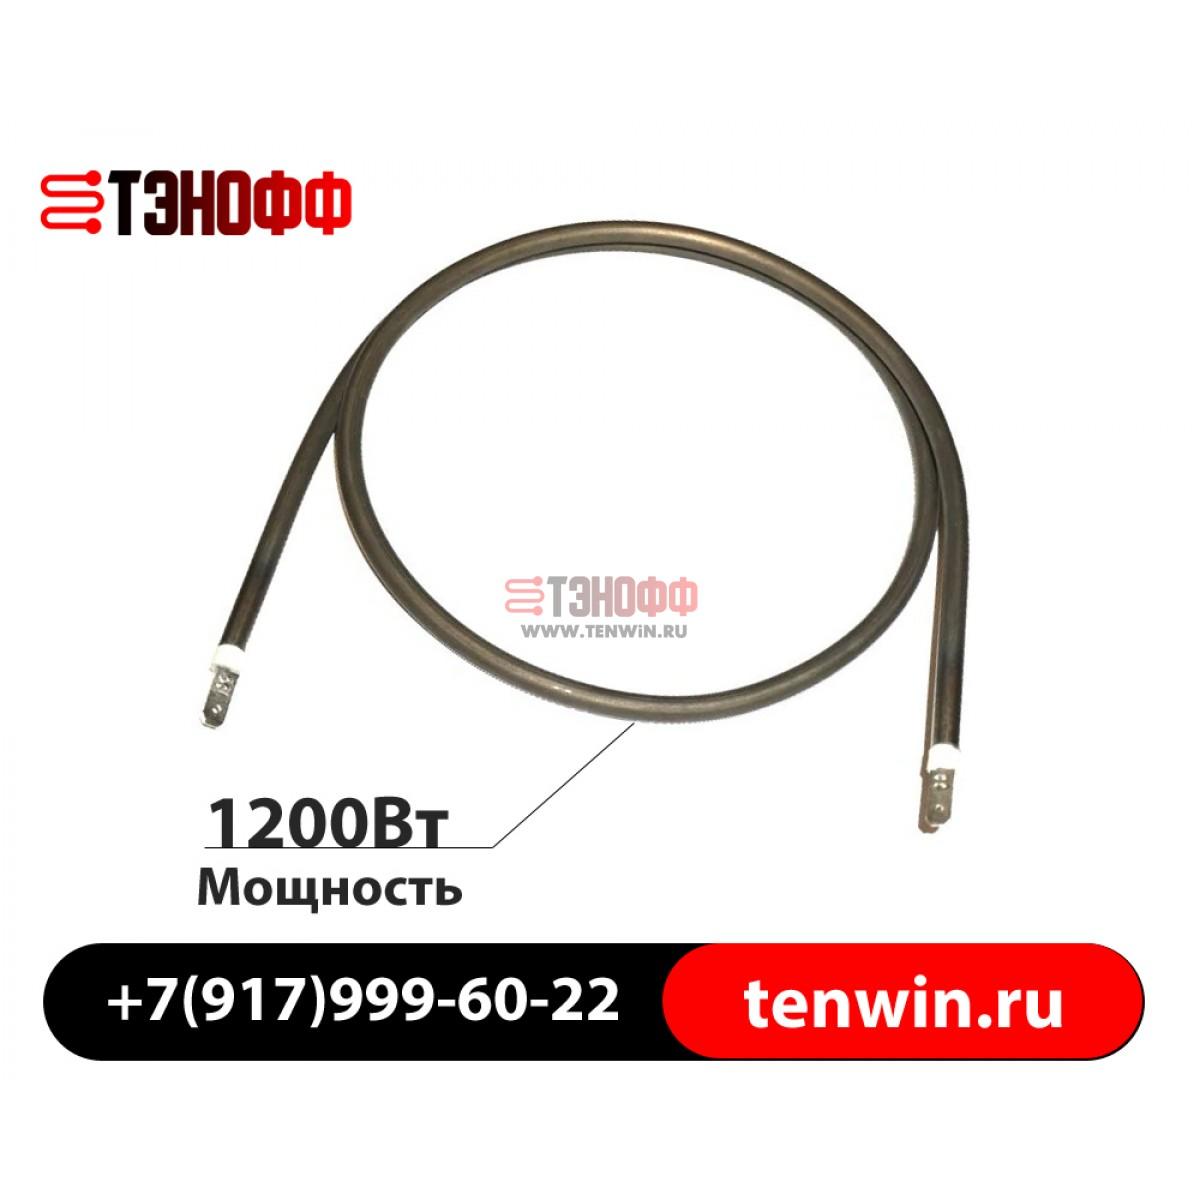 ТЭН 1200Вт воздушный гибкий - длина 1200мм